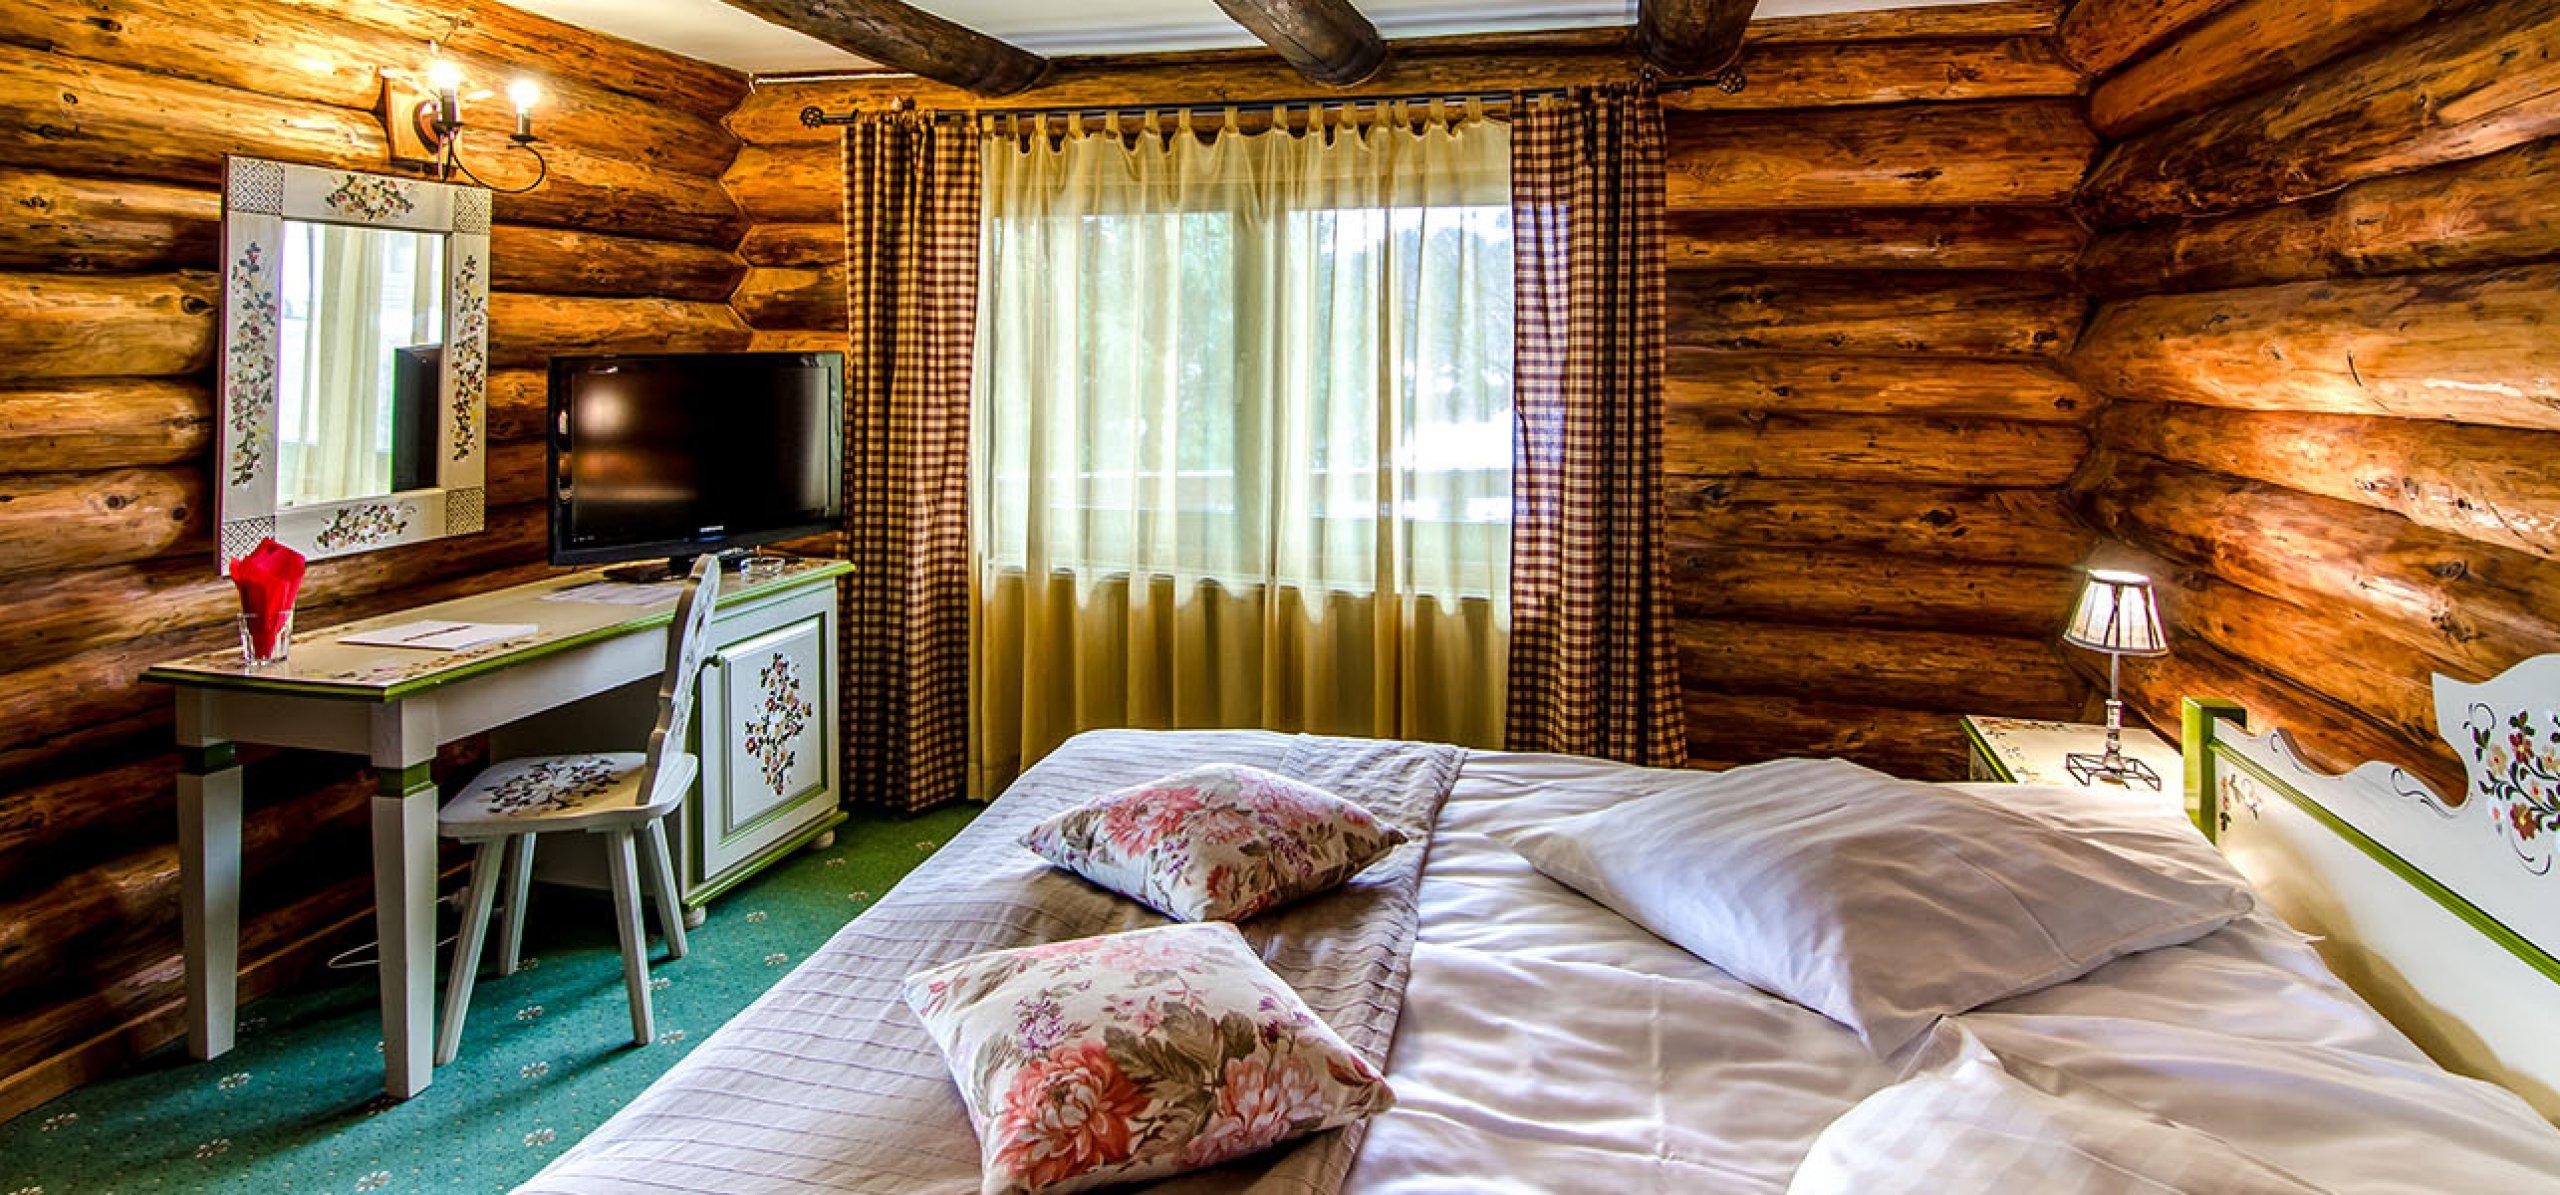 camera-dubla-matrimoniala-luminoasa-vila-carpenul-cheile-gradistei-fundata